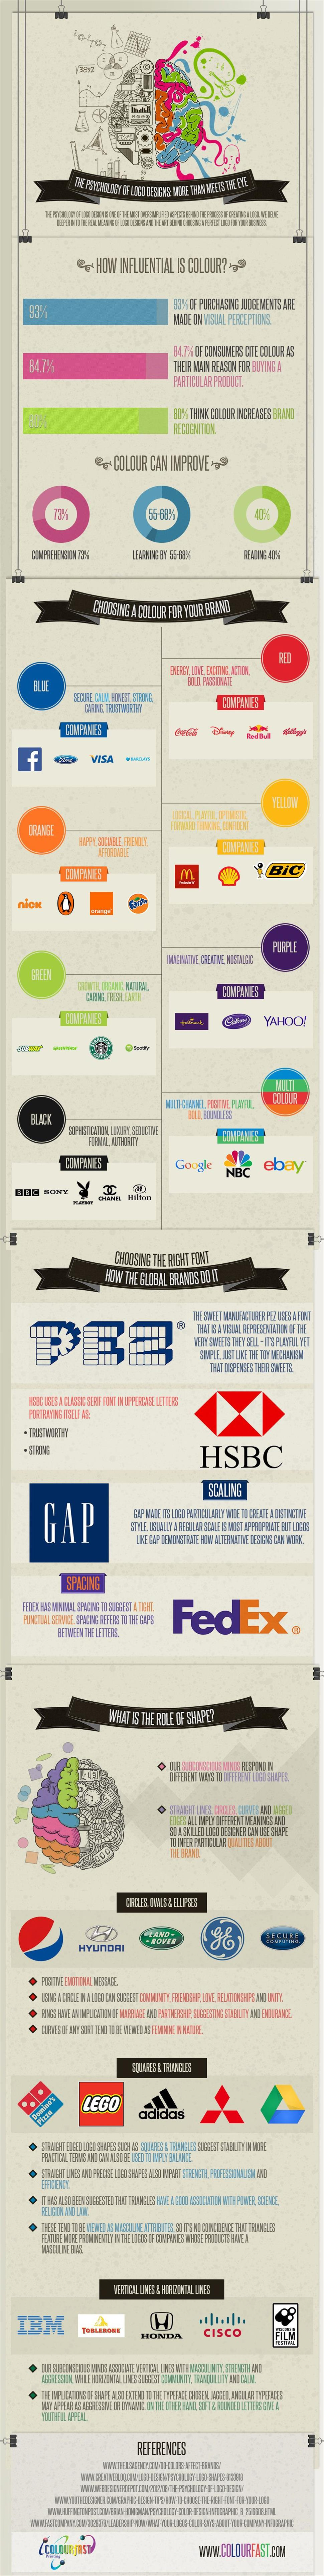 poster on the psychology of logo design